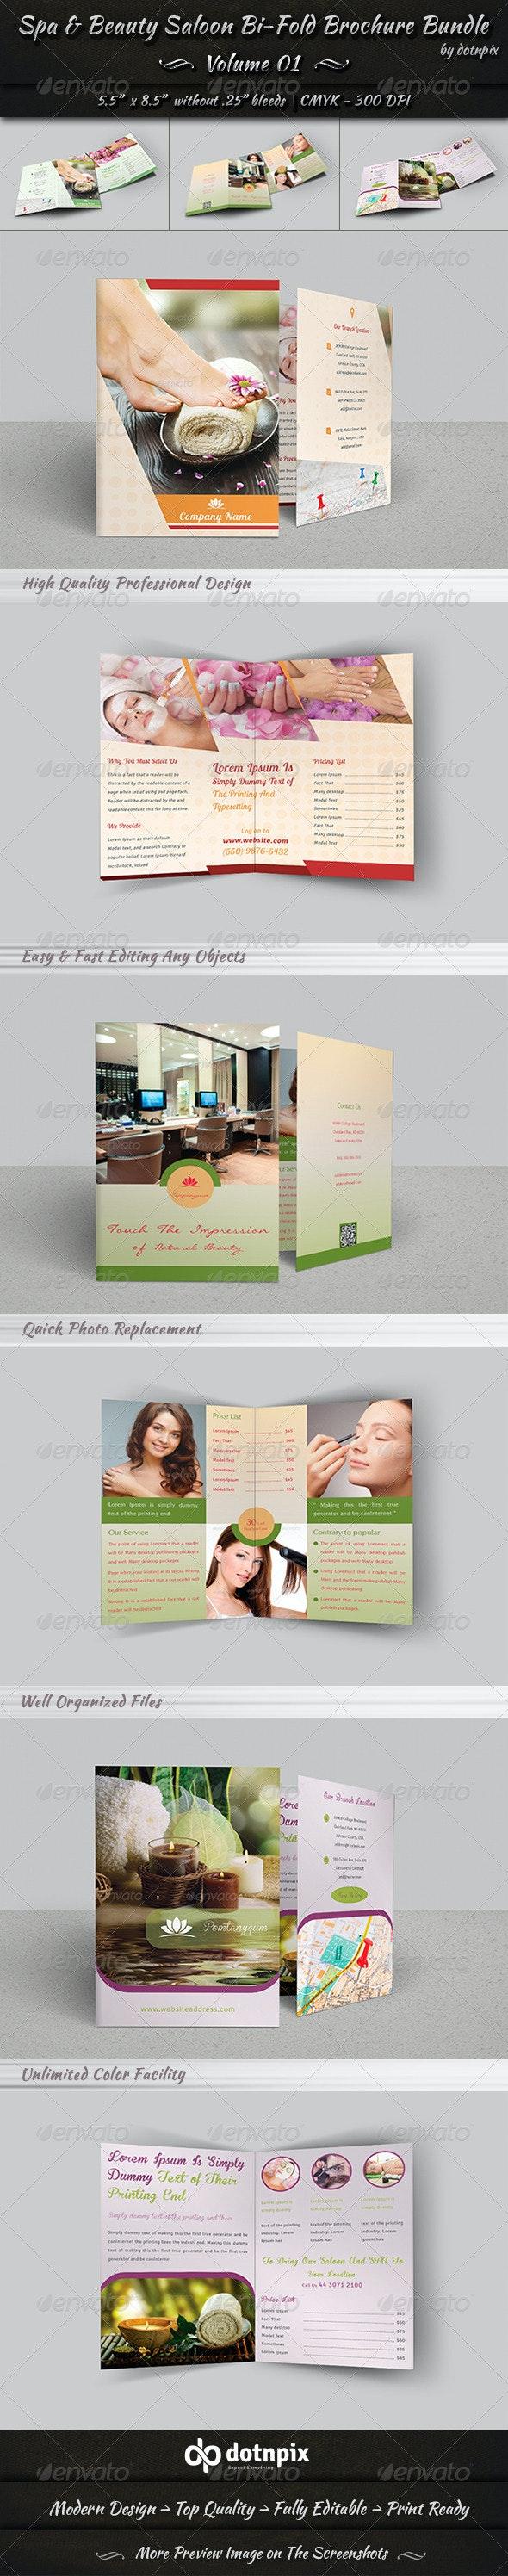 Spa & Beauty Saloon Bi-Fold Brochure Bundle   v1 - Corporate Brochures